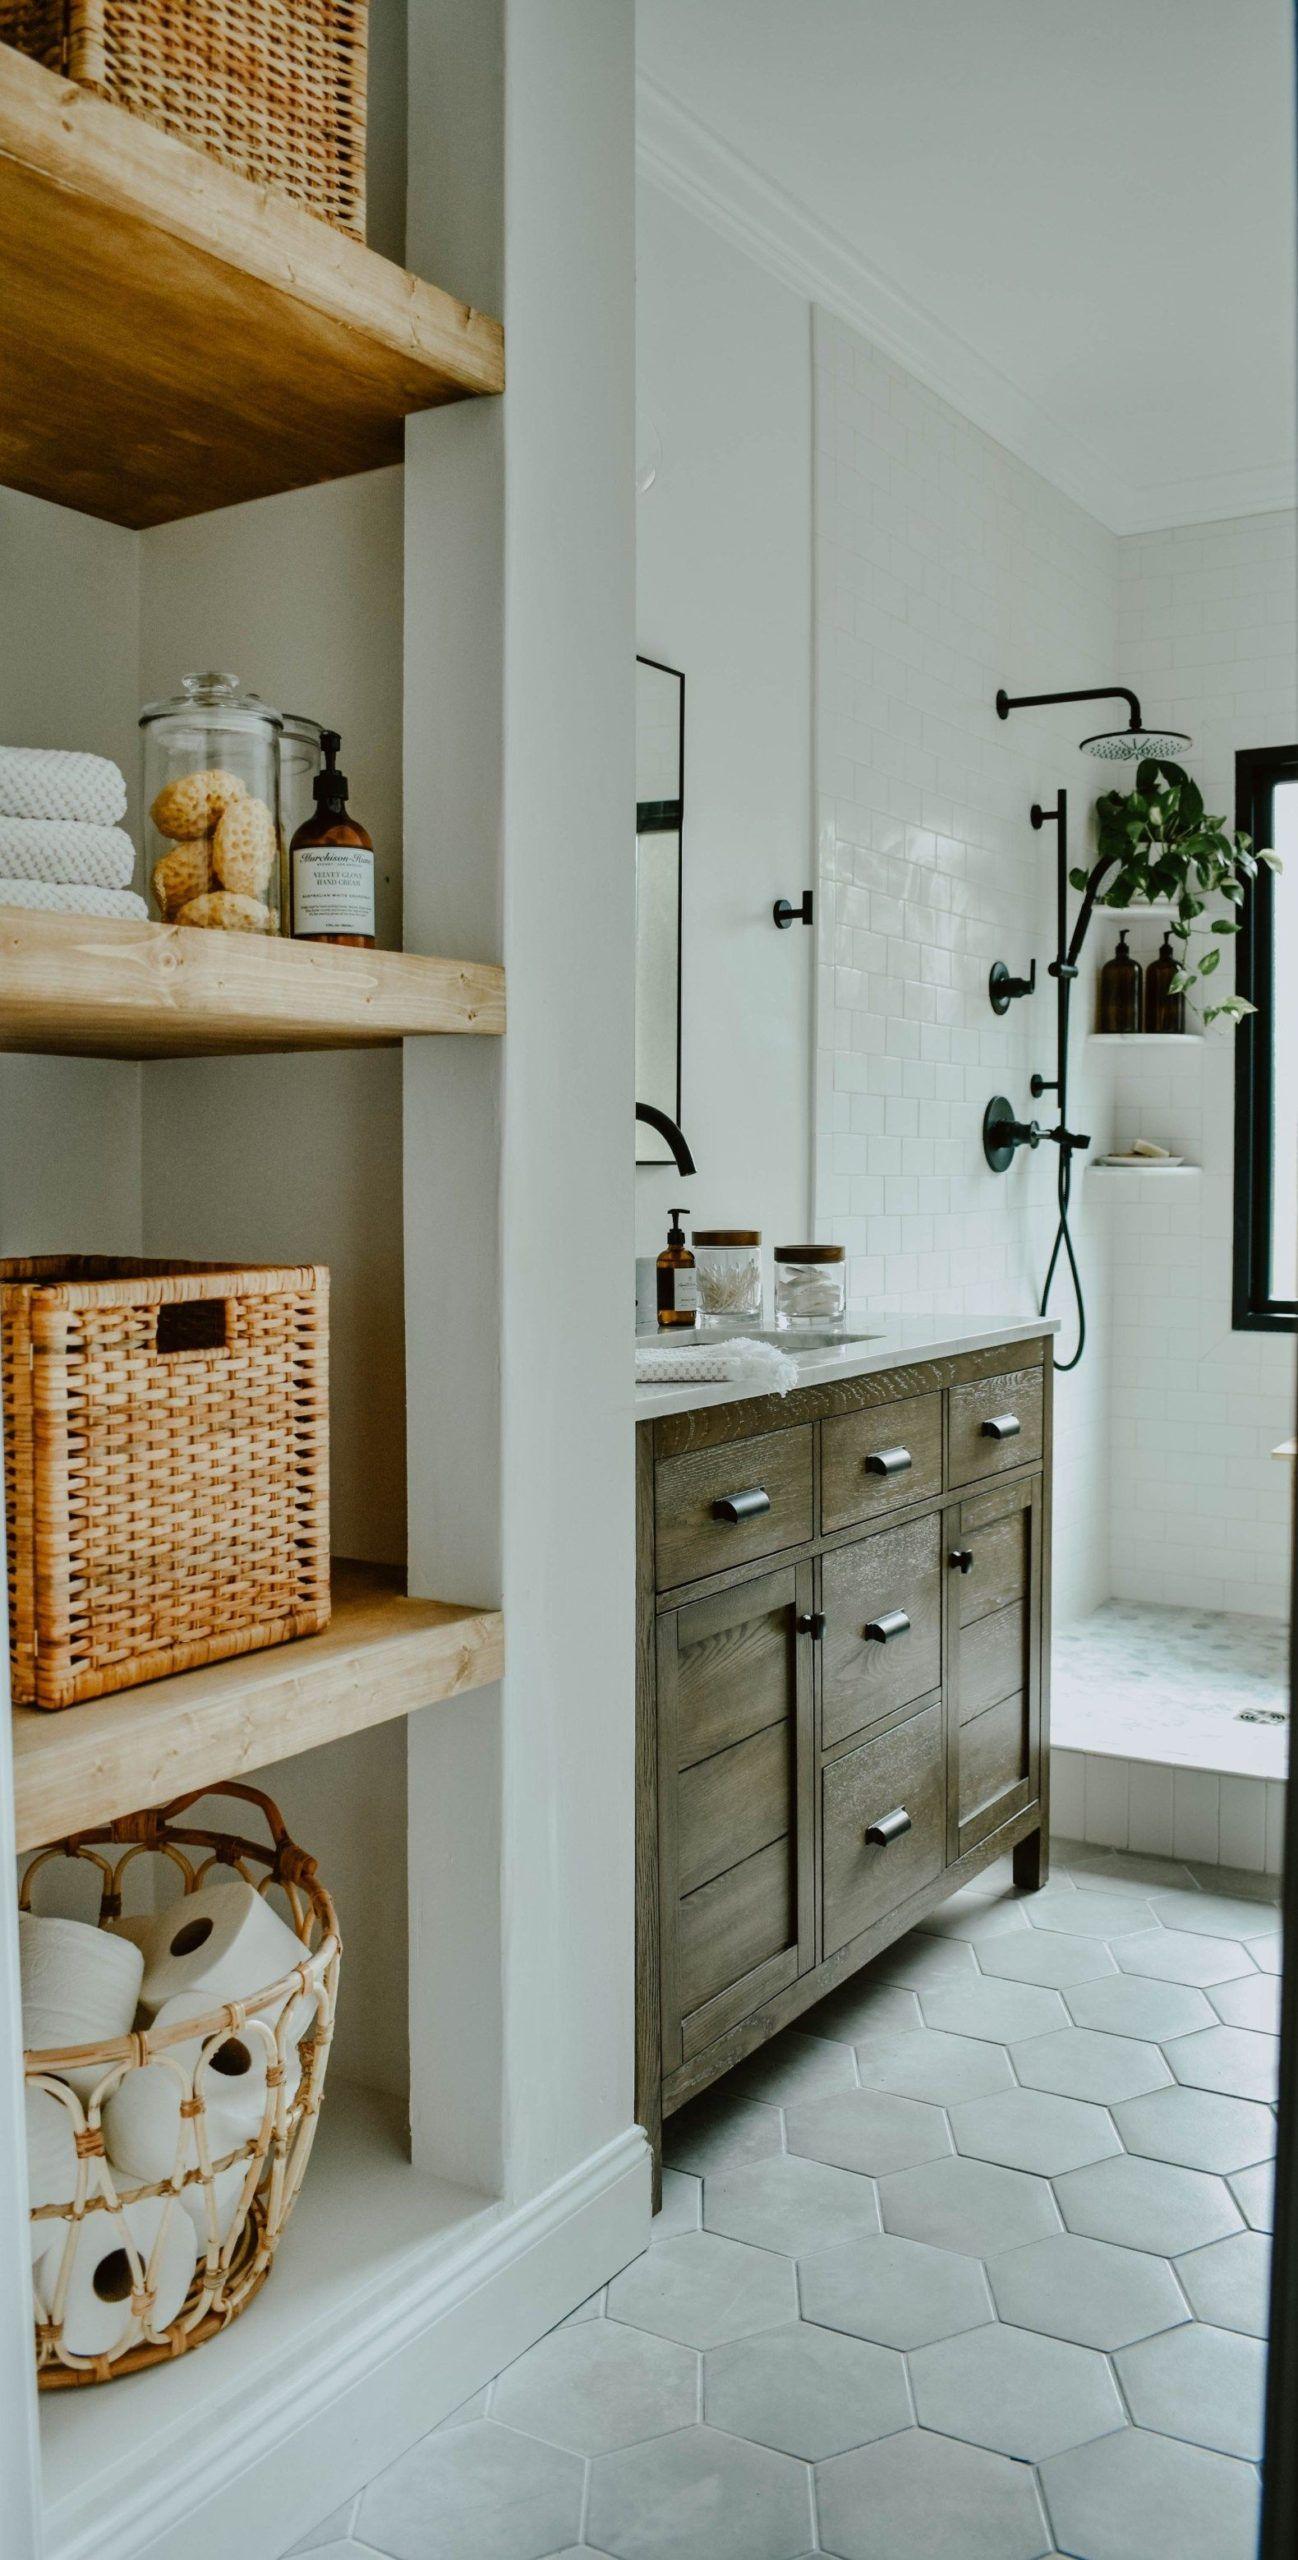 Bathroom By Baden Baden Interior Amsterdam Design Marco Bolderheij Badezimmer Offenes Badezimmer Regal Bad